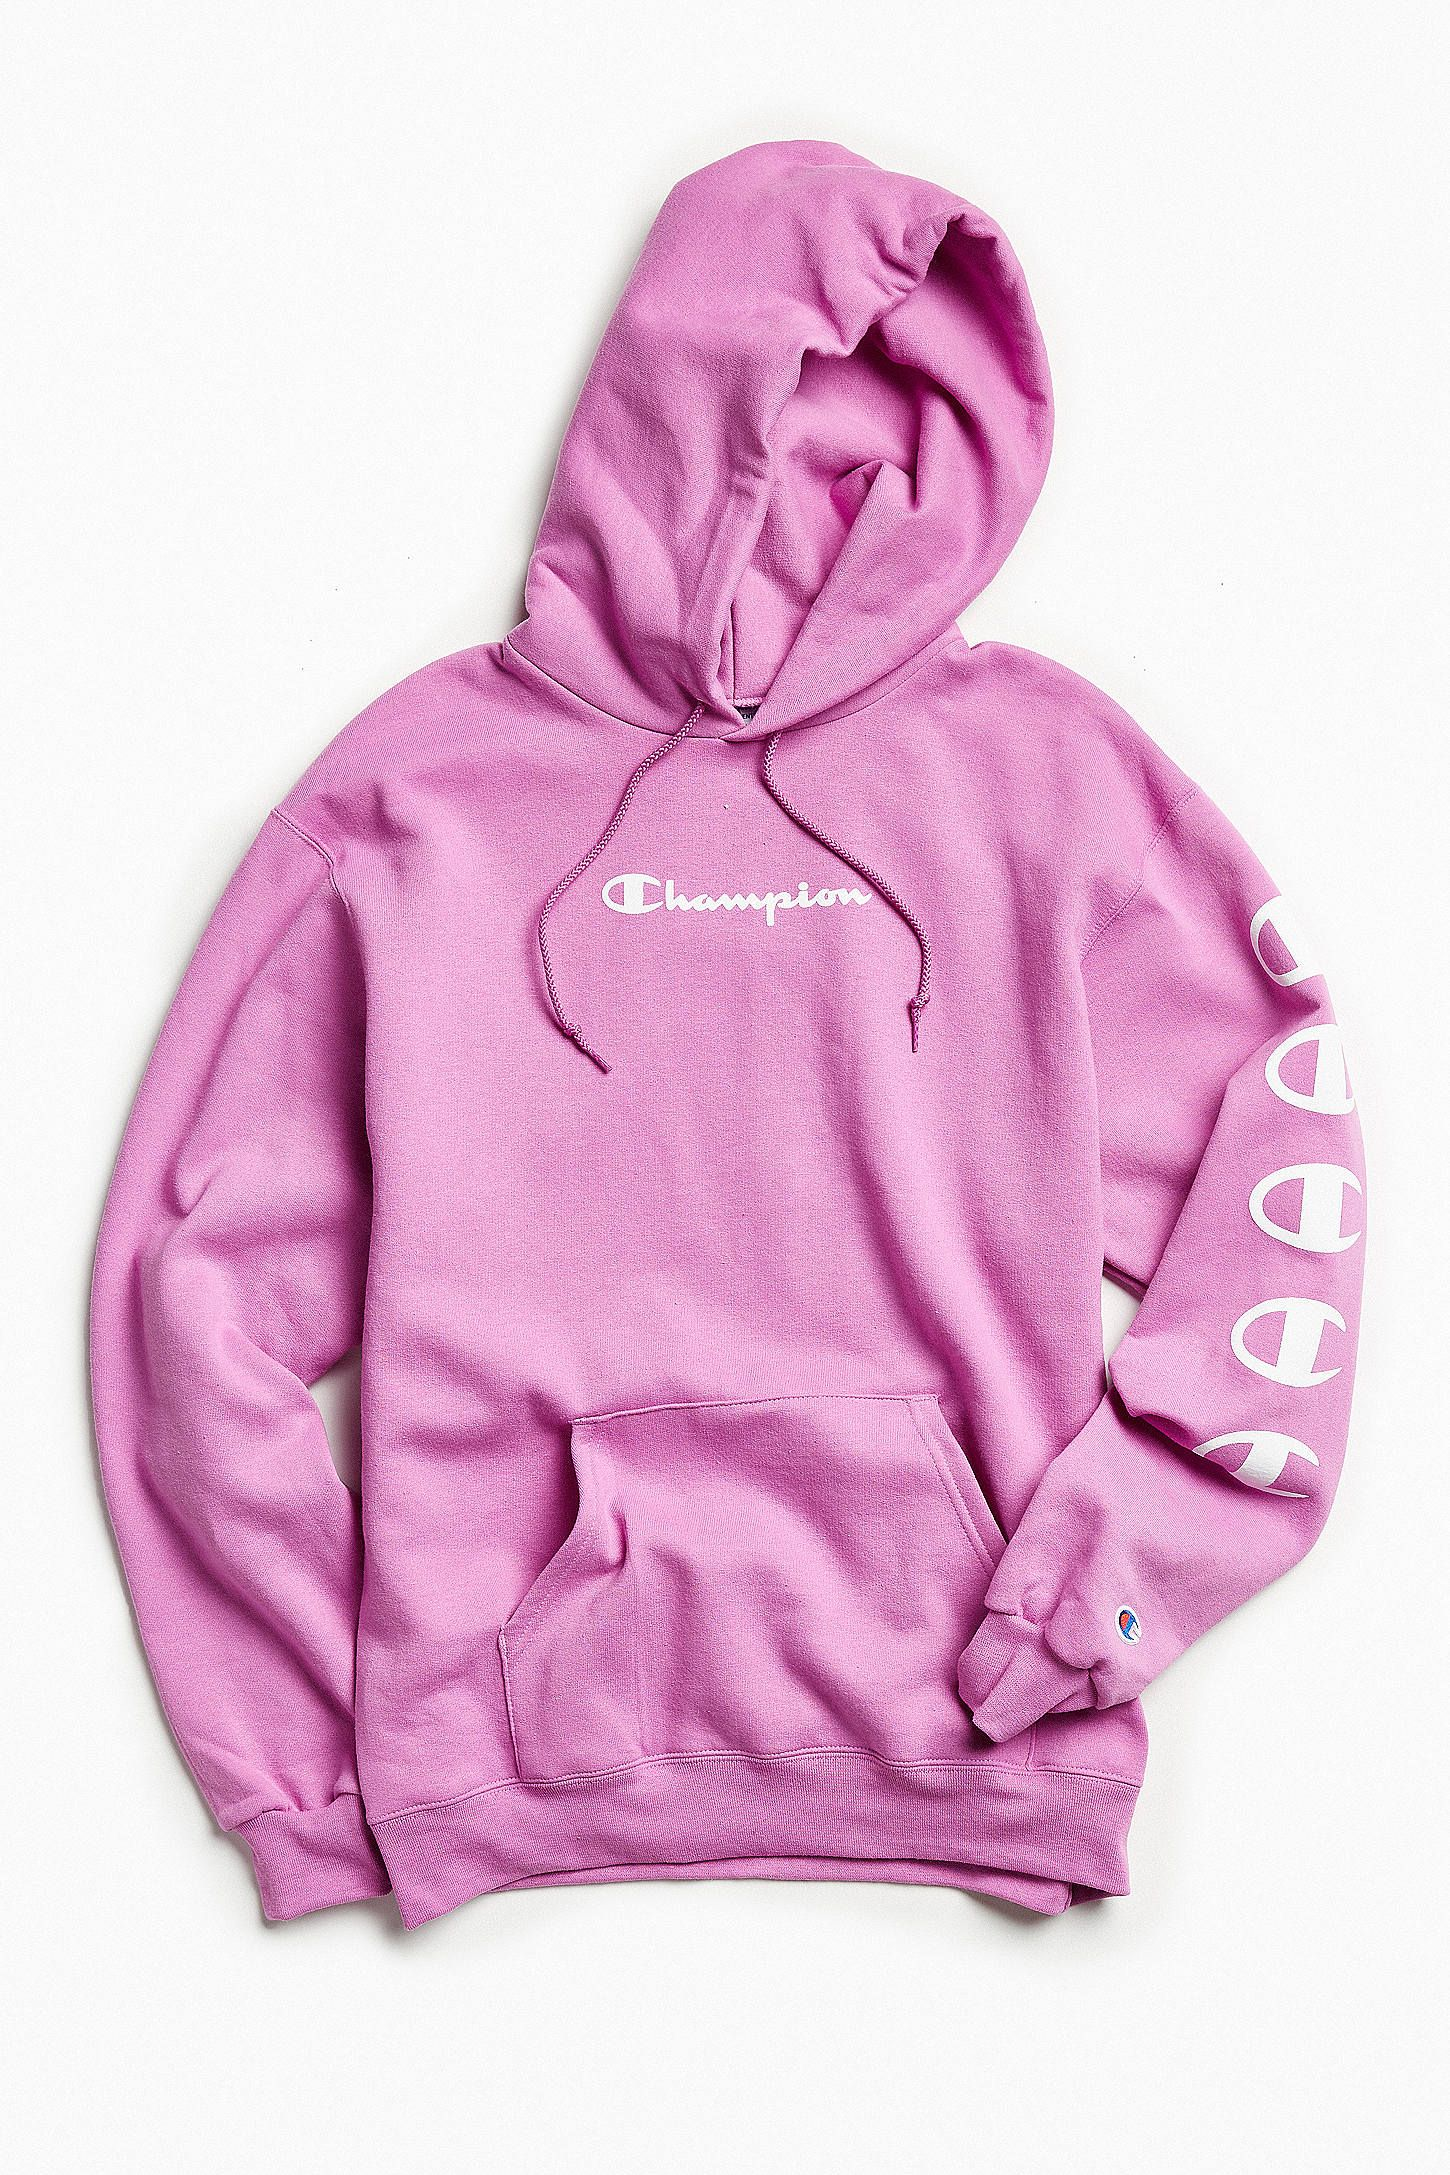 Champion Repeat Eco Hoodie Sweatshirt Sweatshirts Hoodie Hoodies Sweatshirts [ 2175 x 1450 Pixel ]